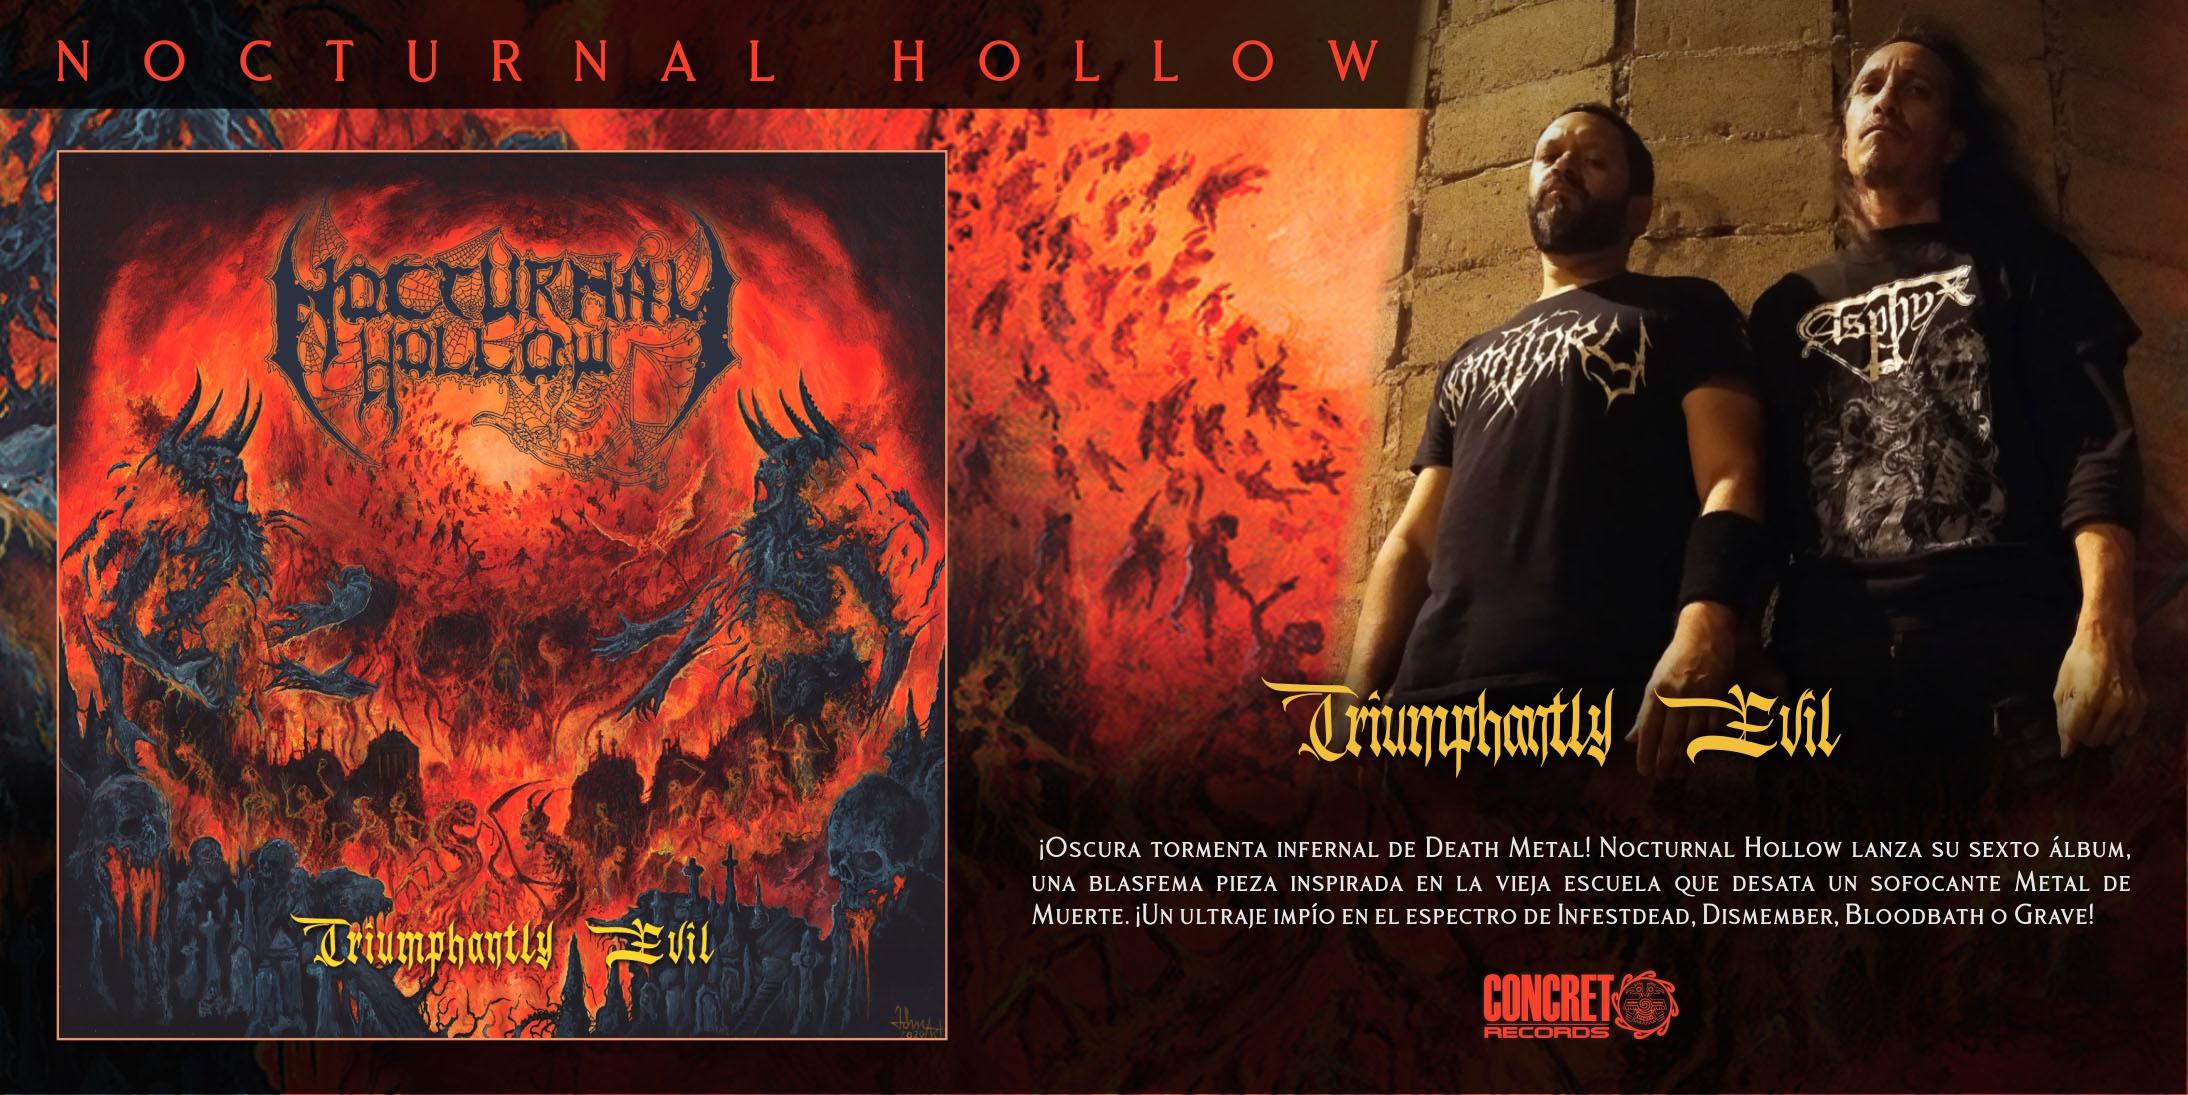 Nocturnal Hollow - Triumphantly Evil - SLIDER